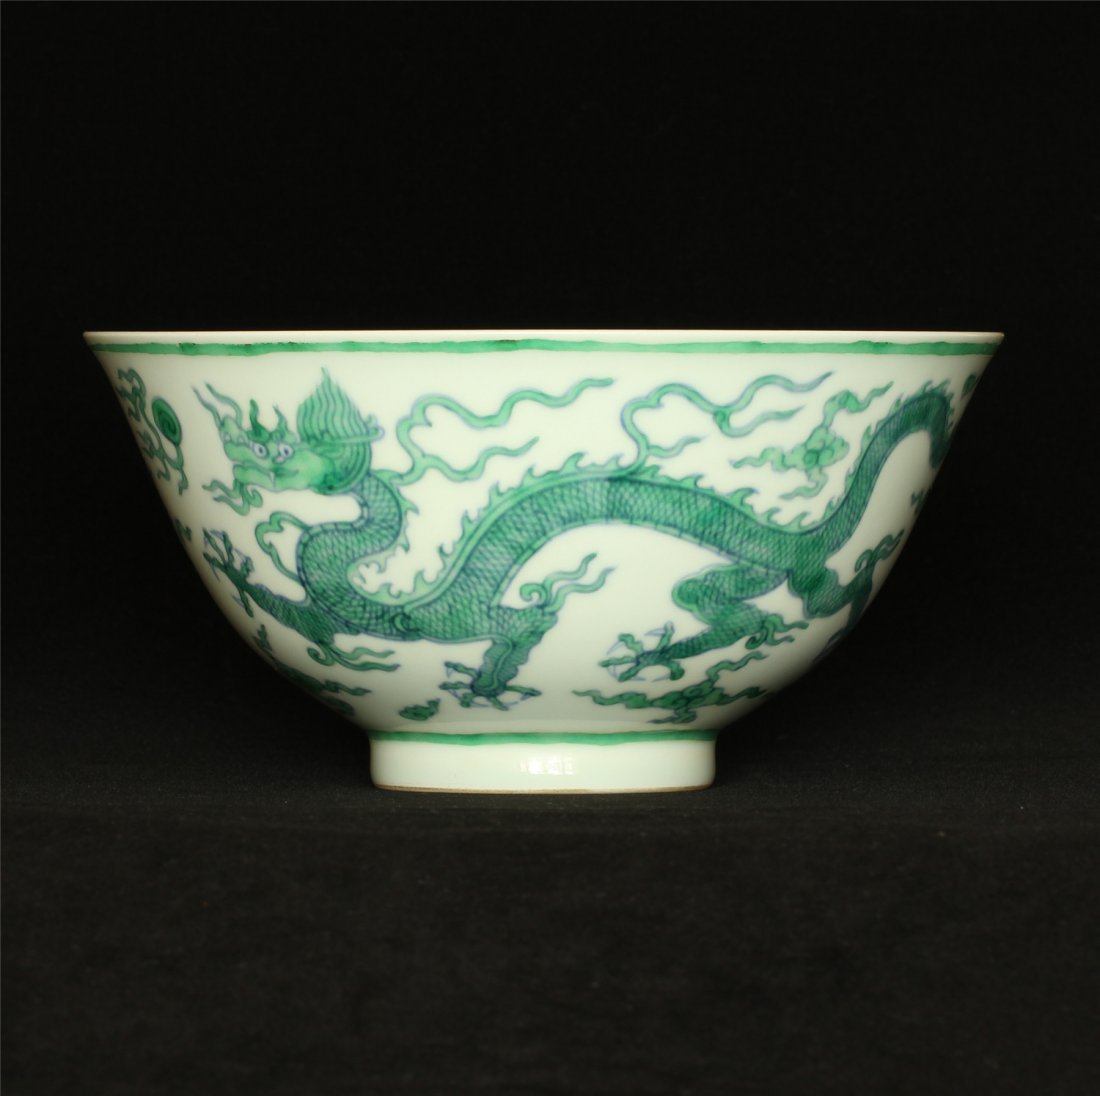 Doucai porcelain bowl of Ming Dynasty ChengHua mark.